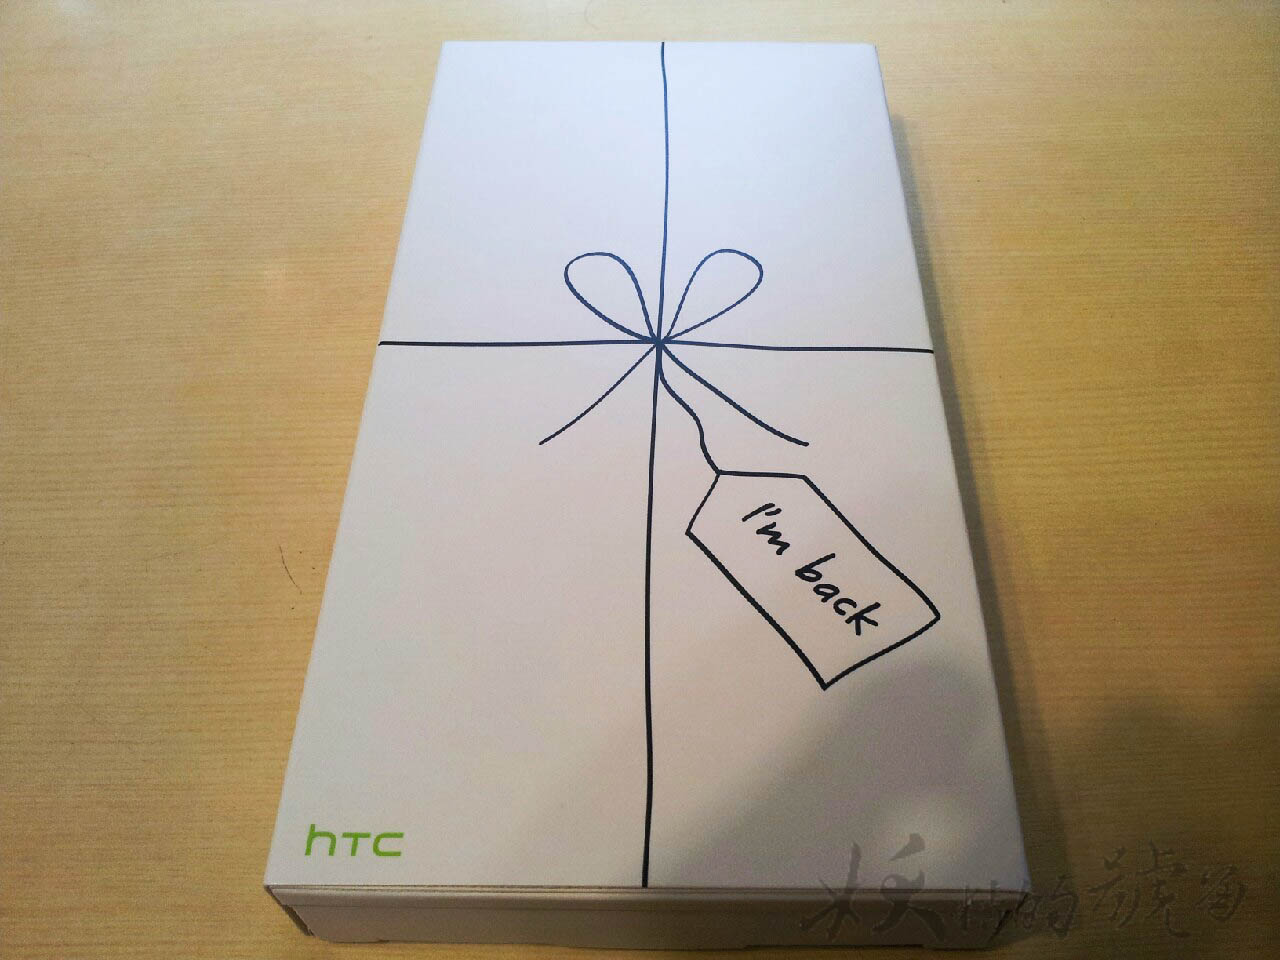 20150806 2968 - HTC Butterfly S 相機紫光 - 過保維修記(已s-off + Unlocked)